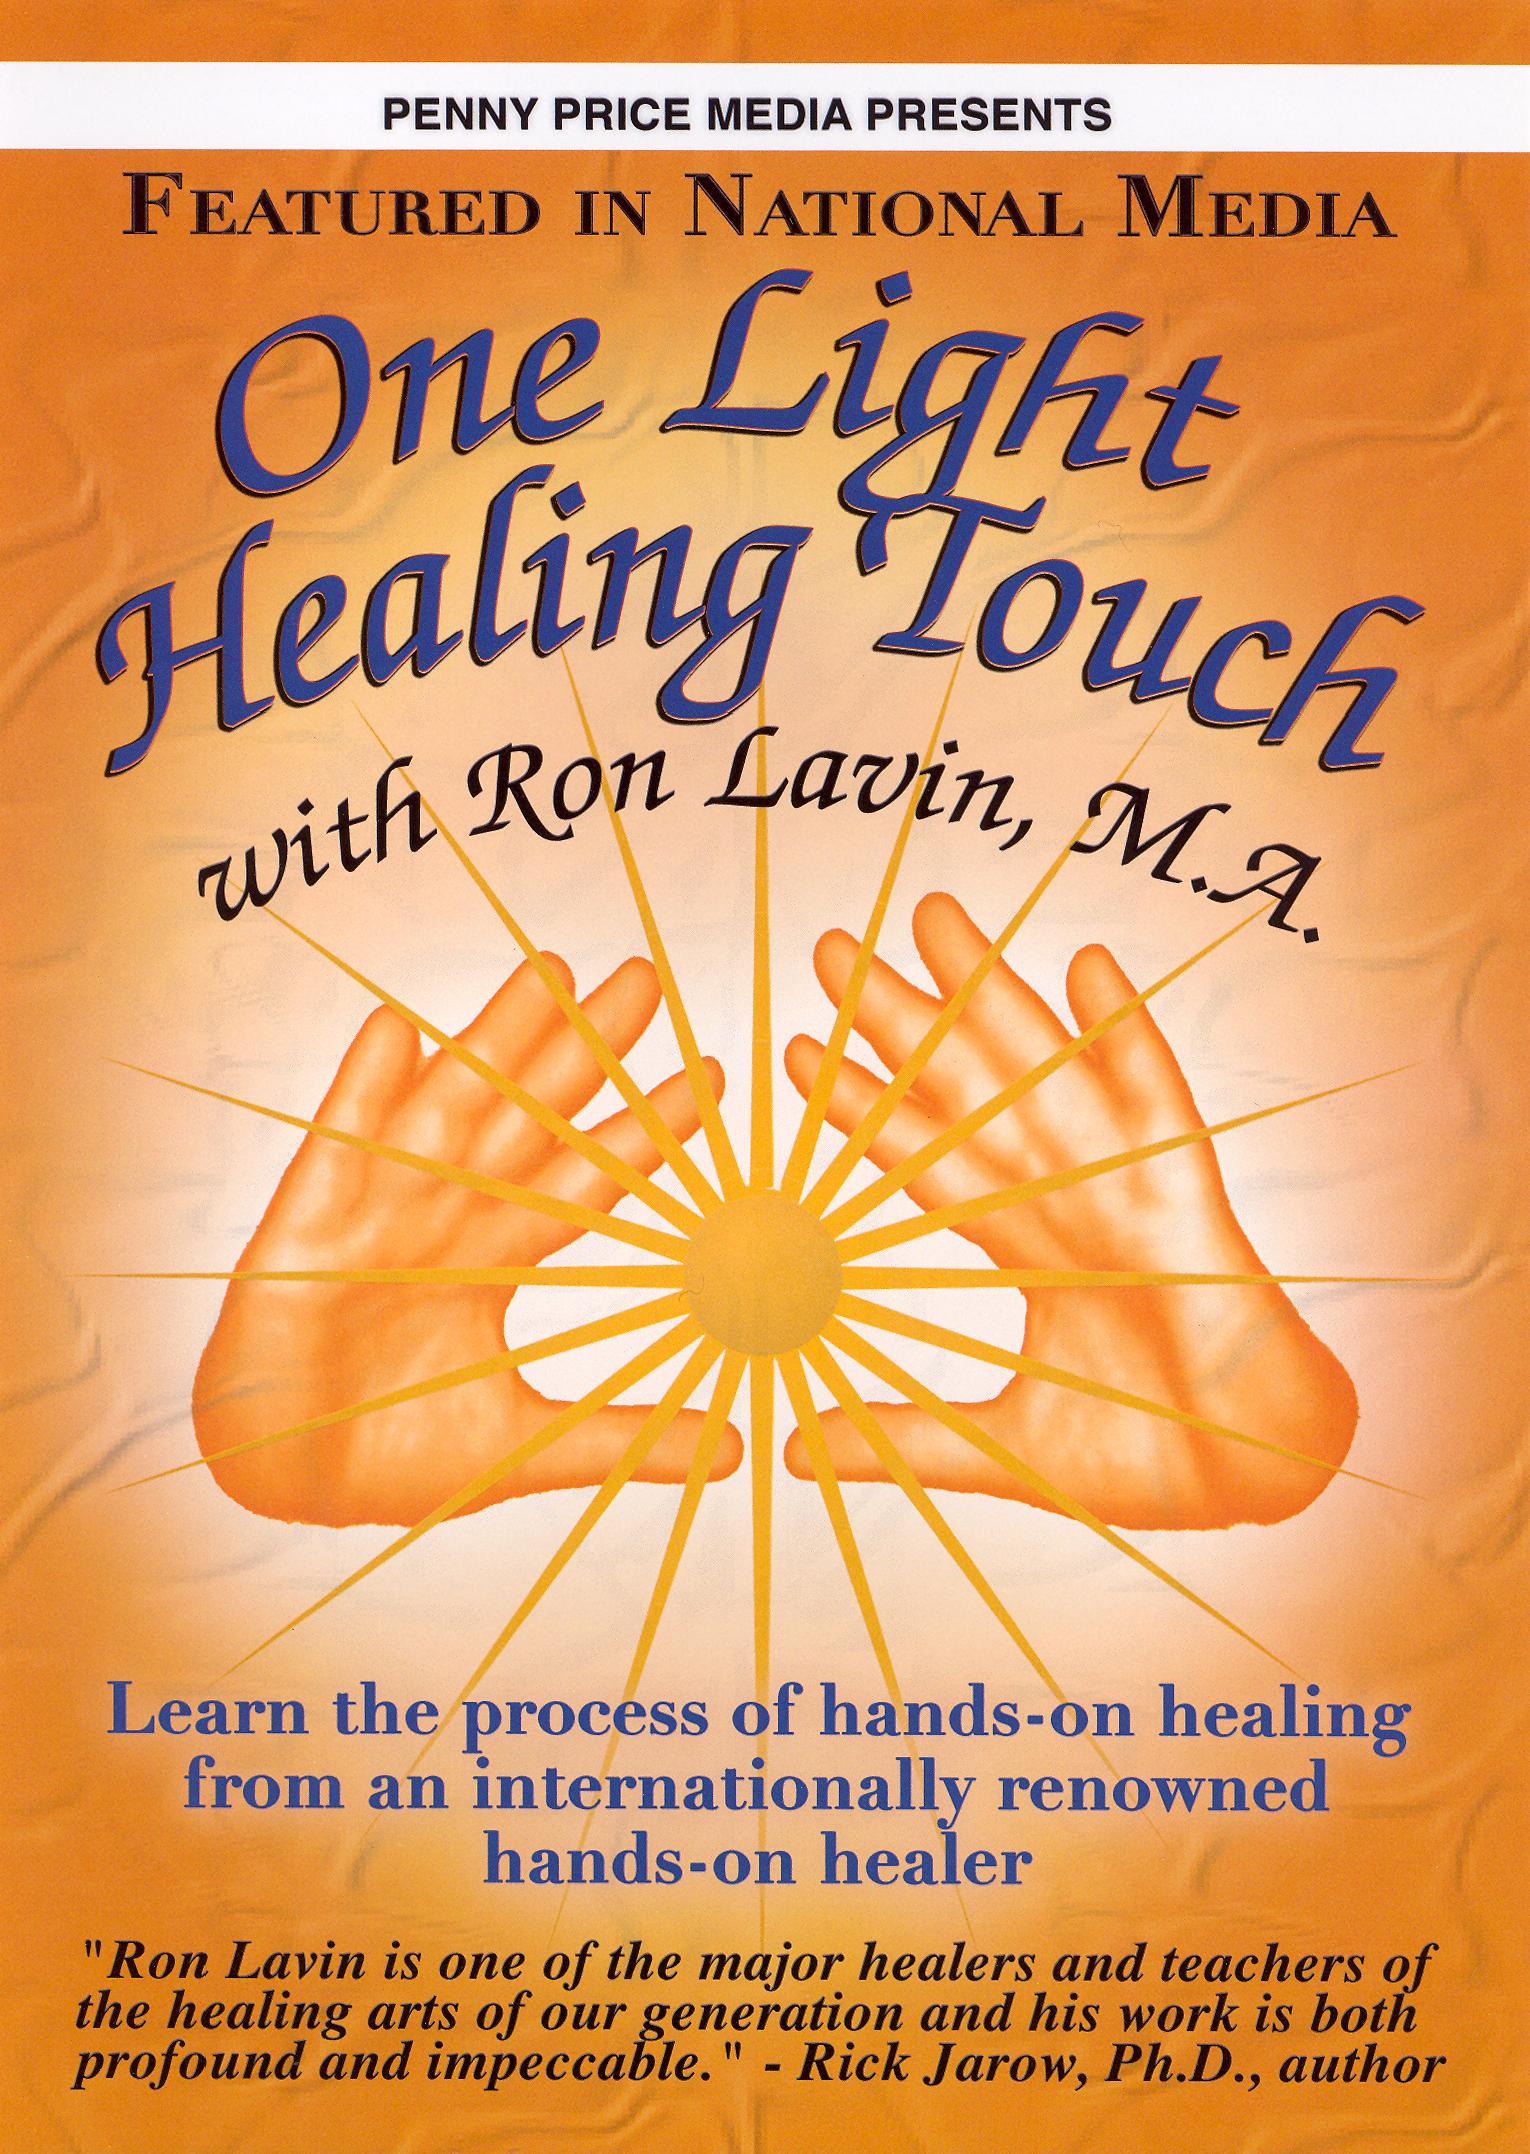 One Light Healing Touch